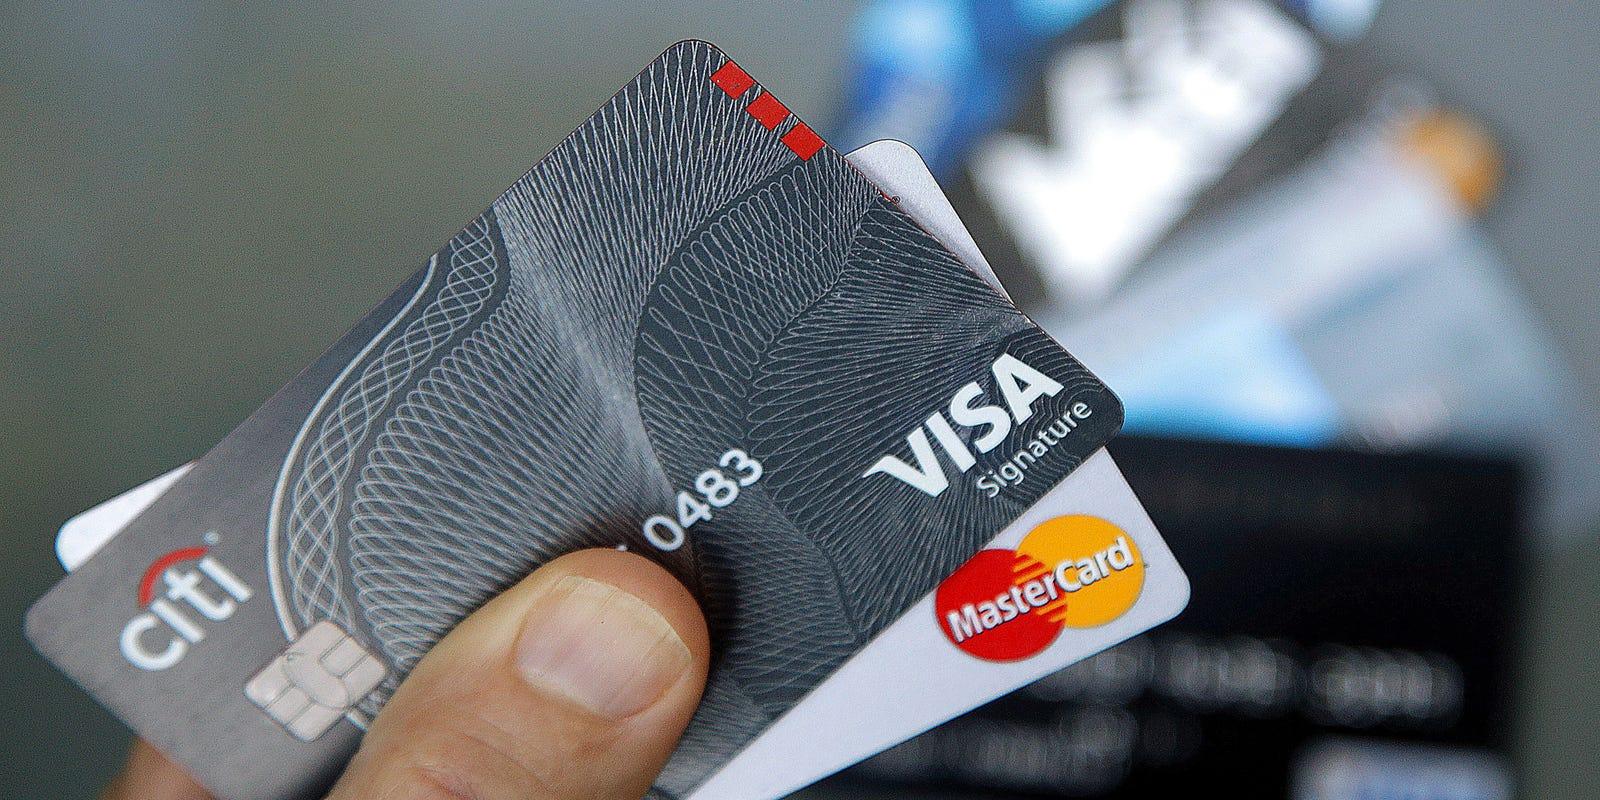 Data breach! 800 million sensitive mortgage documents